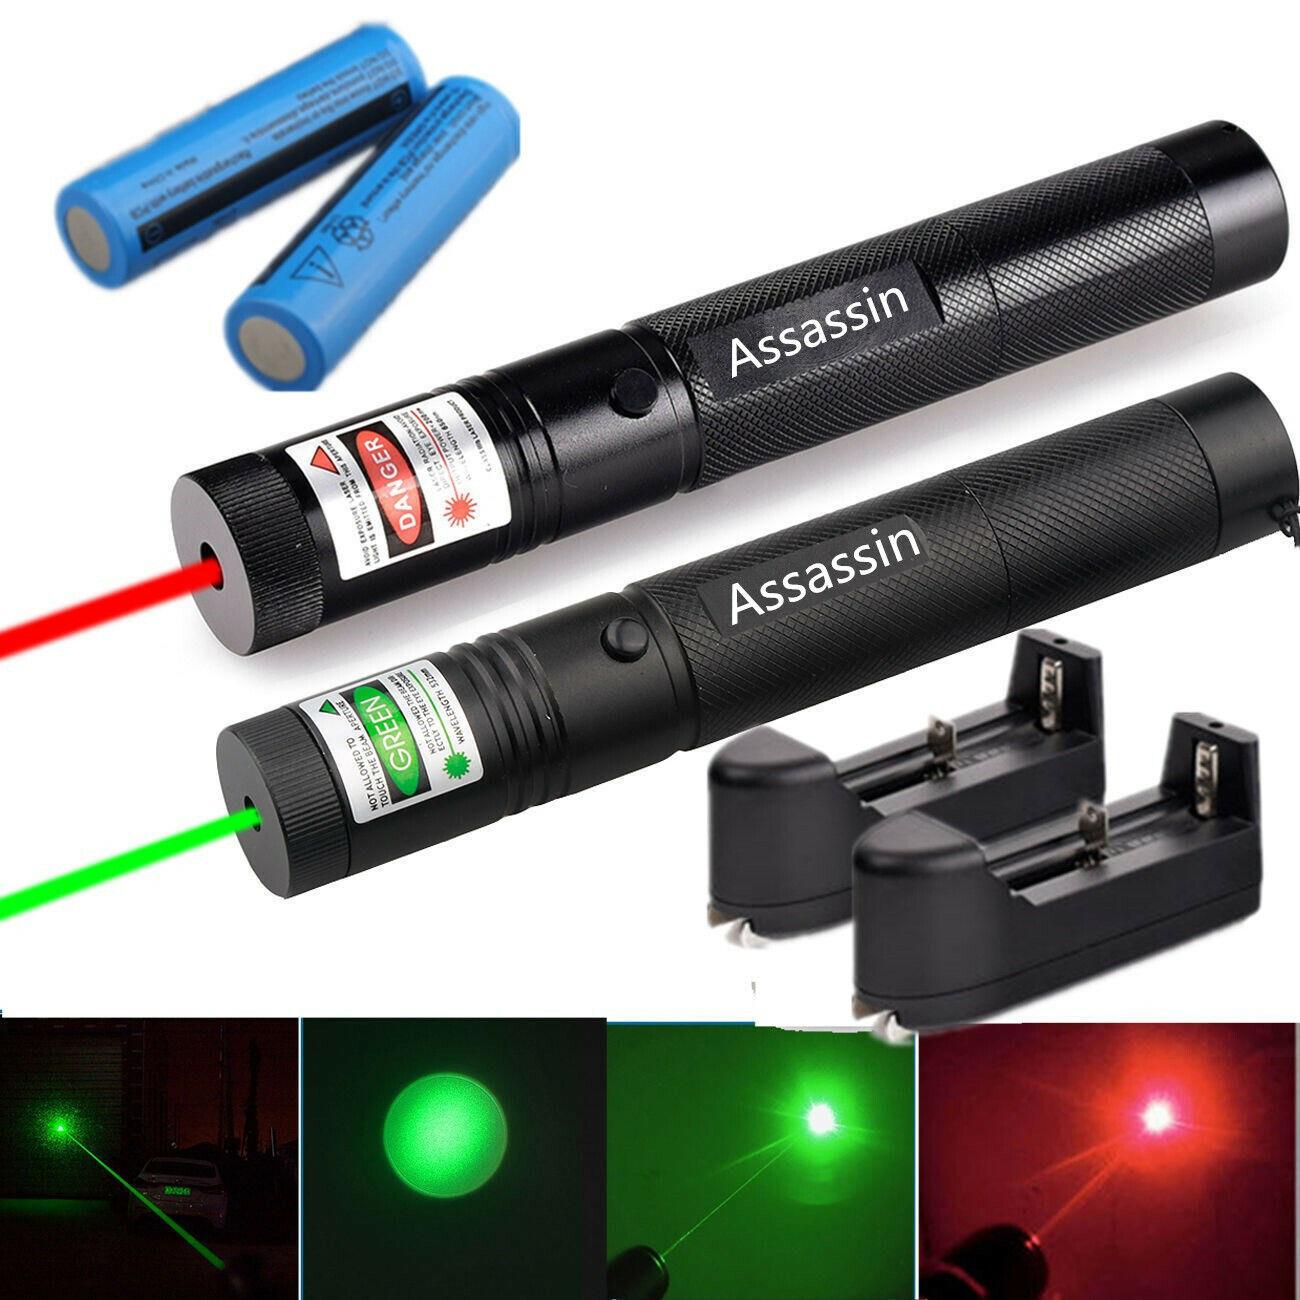 60Miles 532nm Green Laser Pointer Lazer Pen Visible Beam Light Lazer Pet Cat Toy